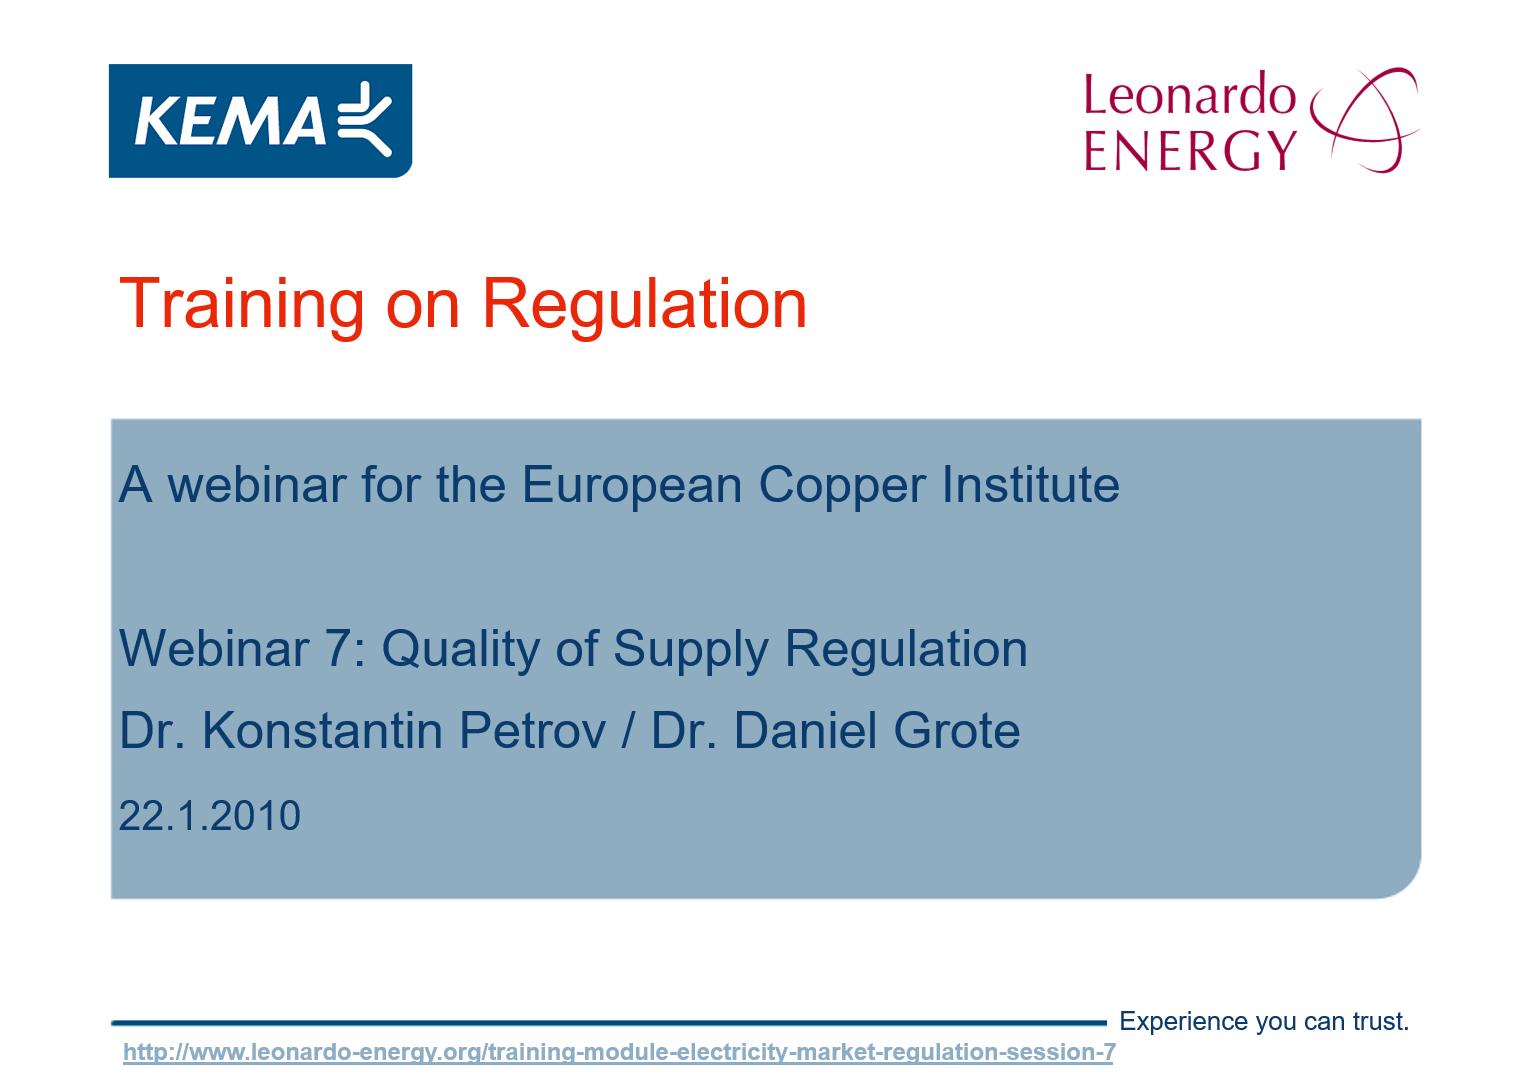 Electricity Markets Regulation Webinar 7 - Quality of Supply Regulation_figure1